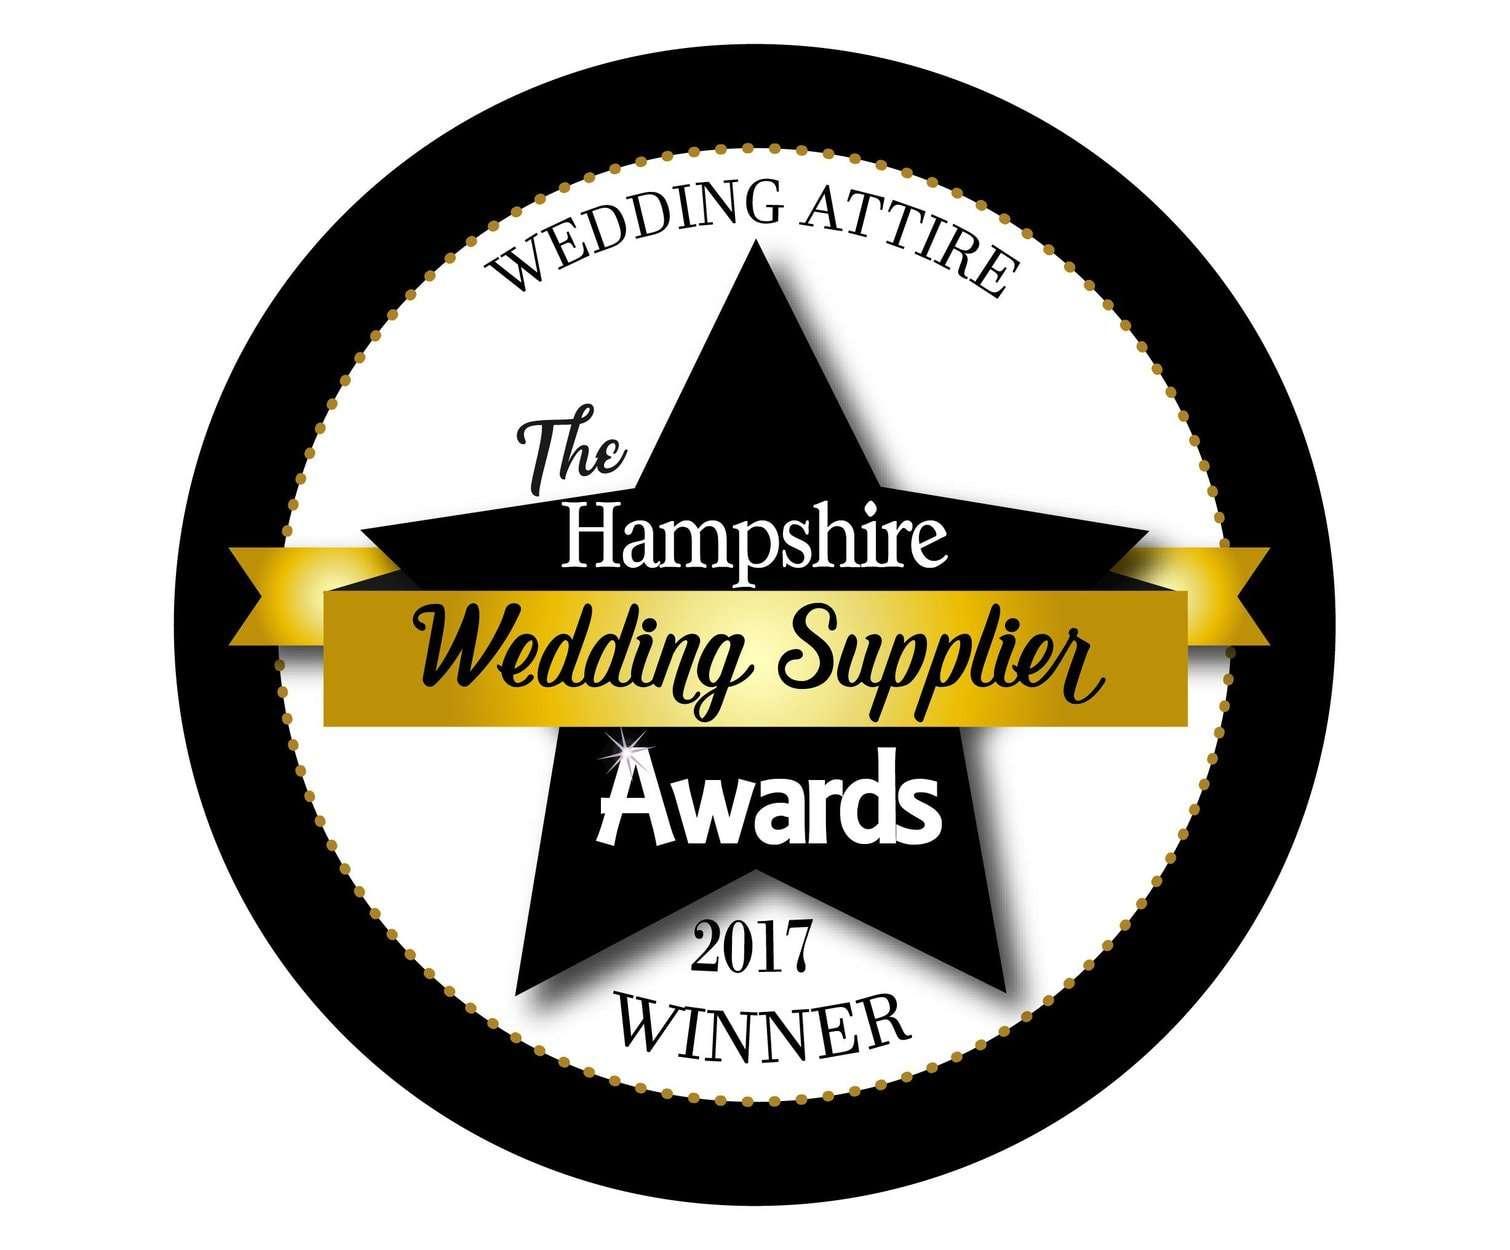 Winner Best Bridal Attire in Hampshire 2017